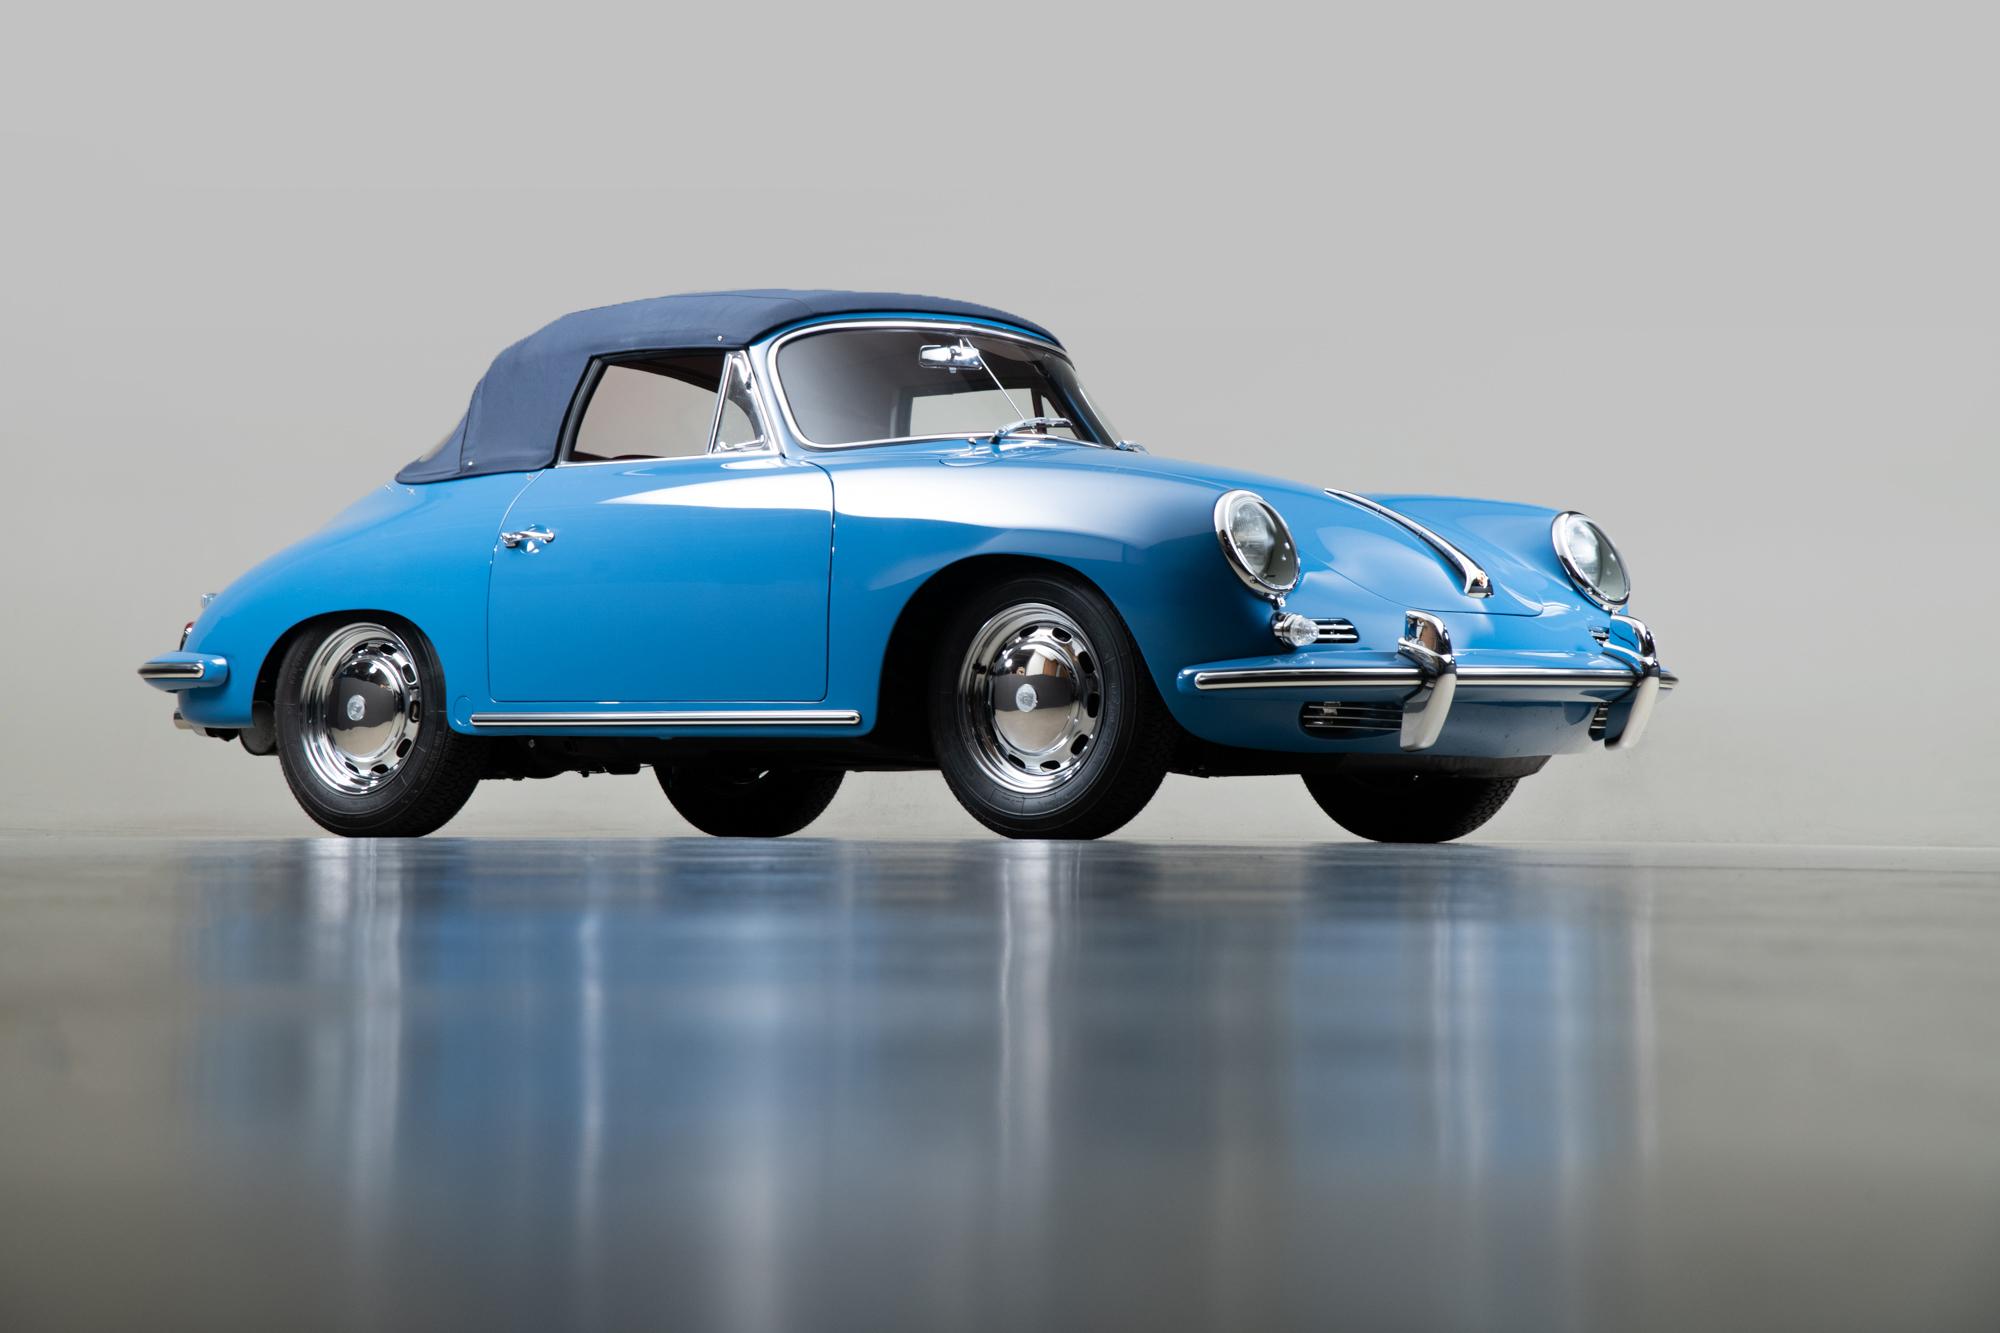 1964 Porsche 356 C Cabriolet , SKY BLUE, VIN 160104, MILEAGE 320